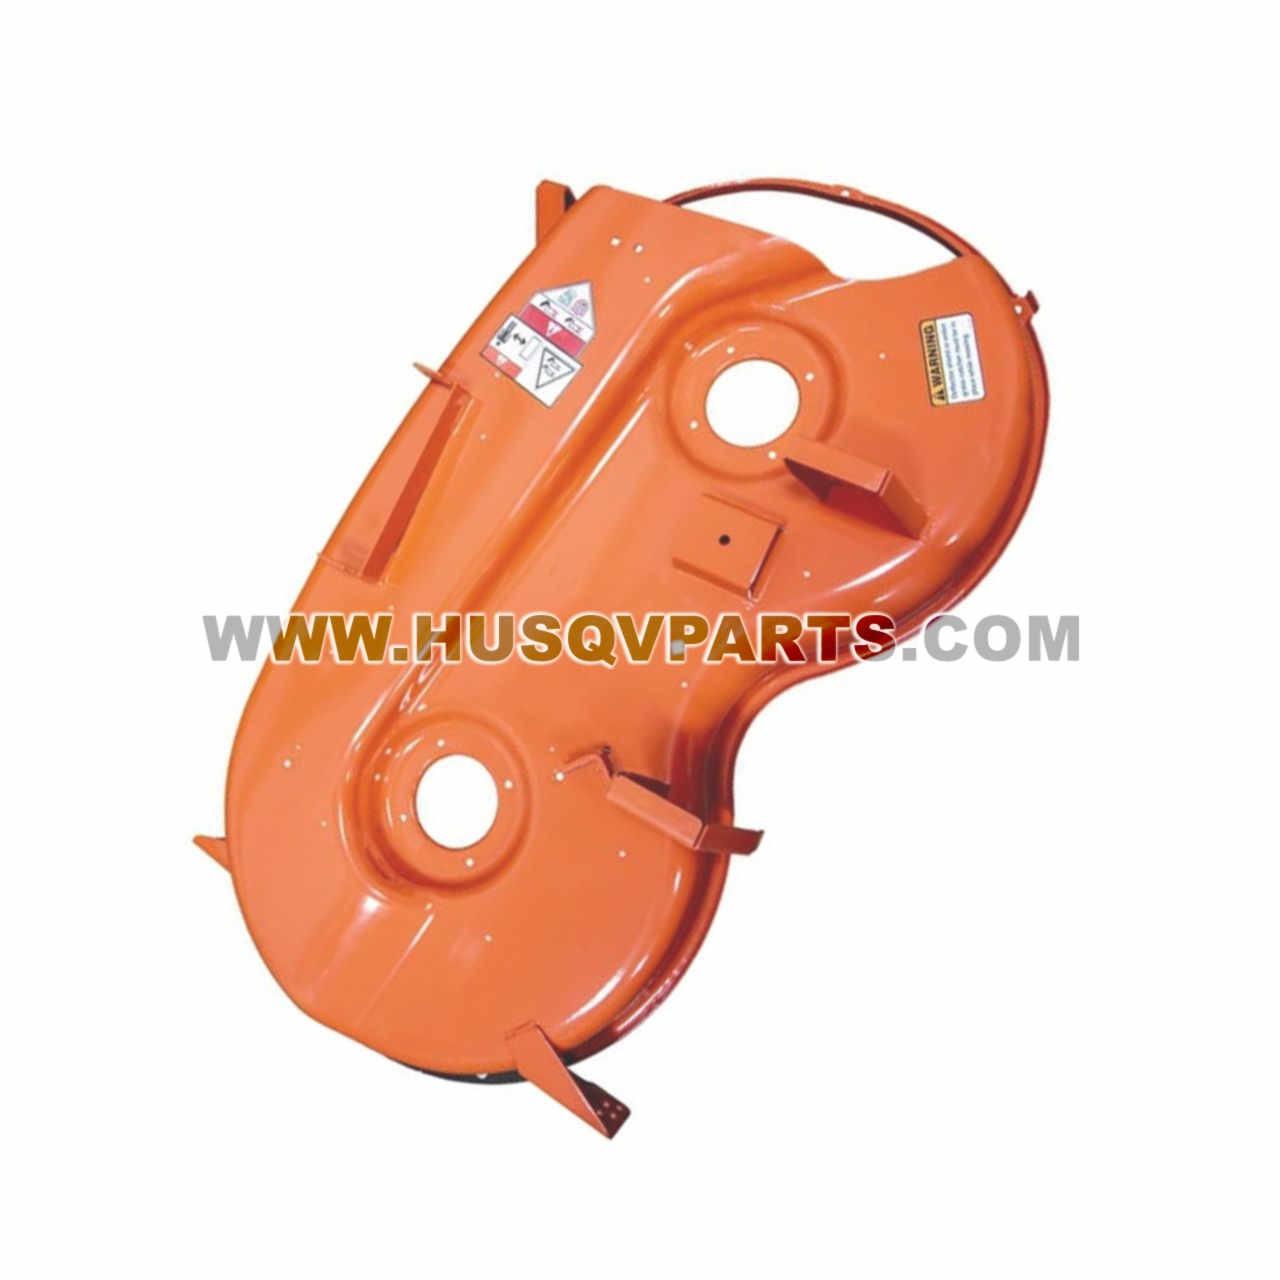 "HUSQVARNA Deck W/Decals 46"" Orange 579589201 Image 1"